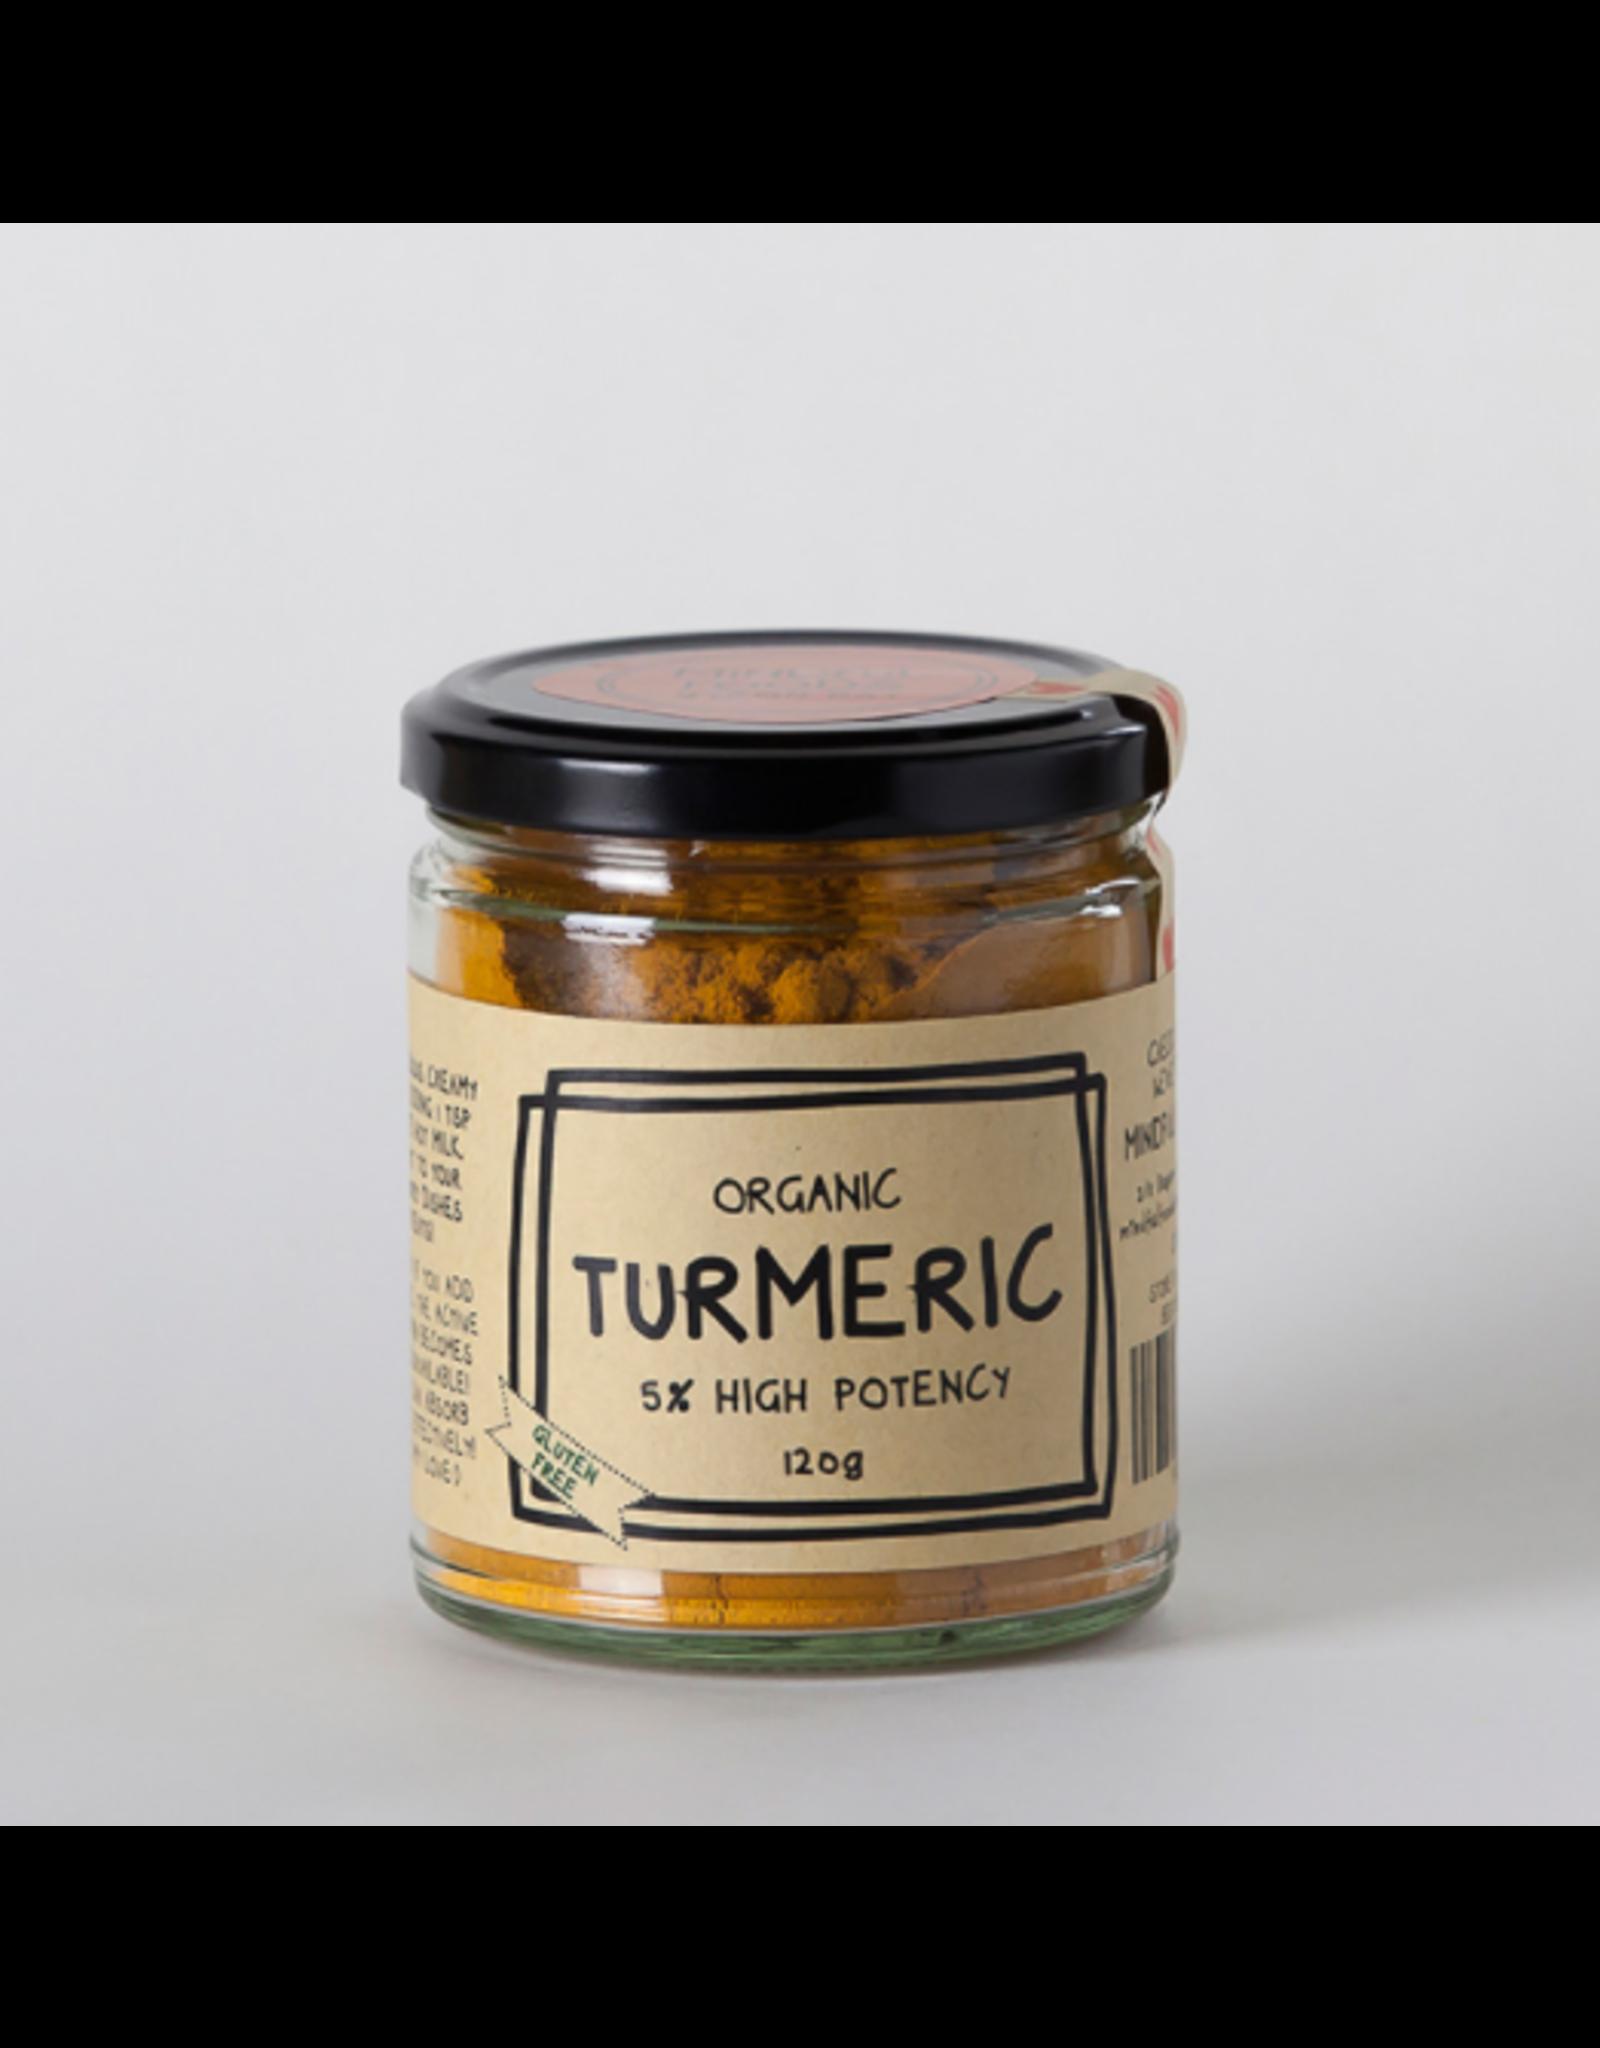 Mindful Foods Organic Turmeric (High Potency 5% Curcumin) 120g Jar